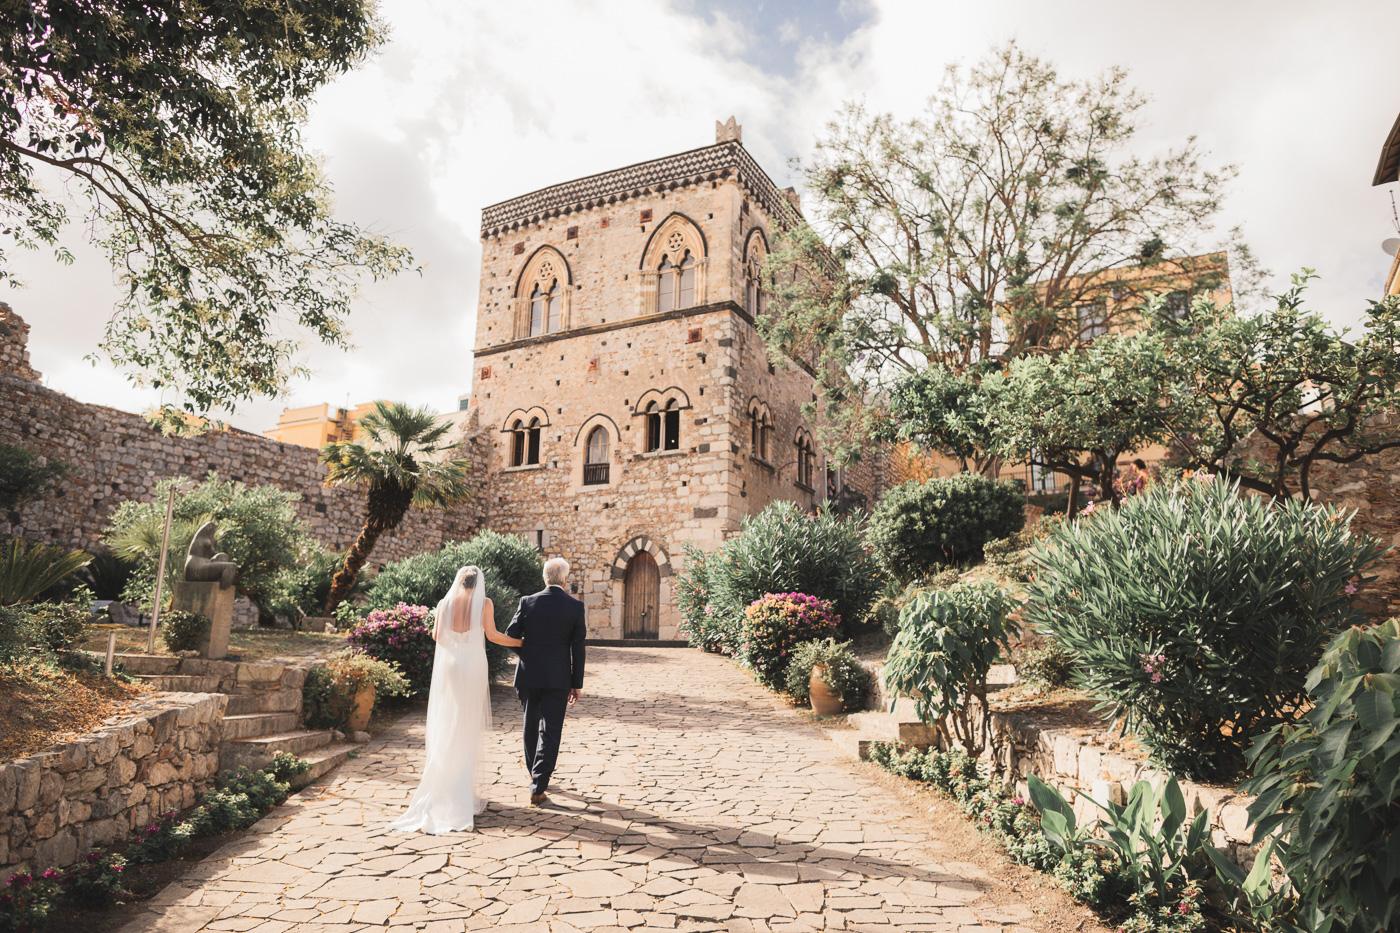 Matrimonio Irlandese Taormina_fotografo_matrimonio-palazzo-duchi-santo-stafano-ingresso-sposa-padre